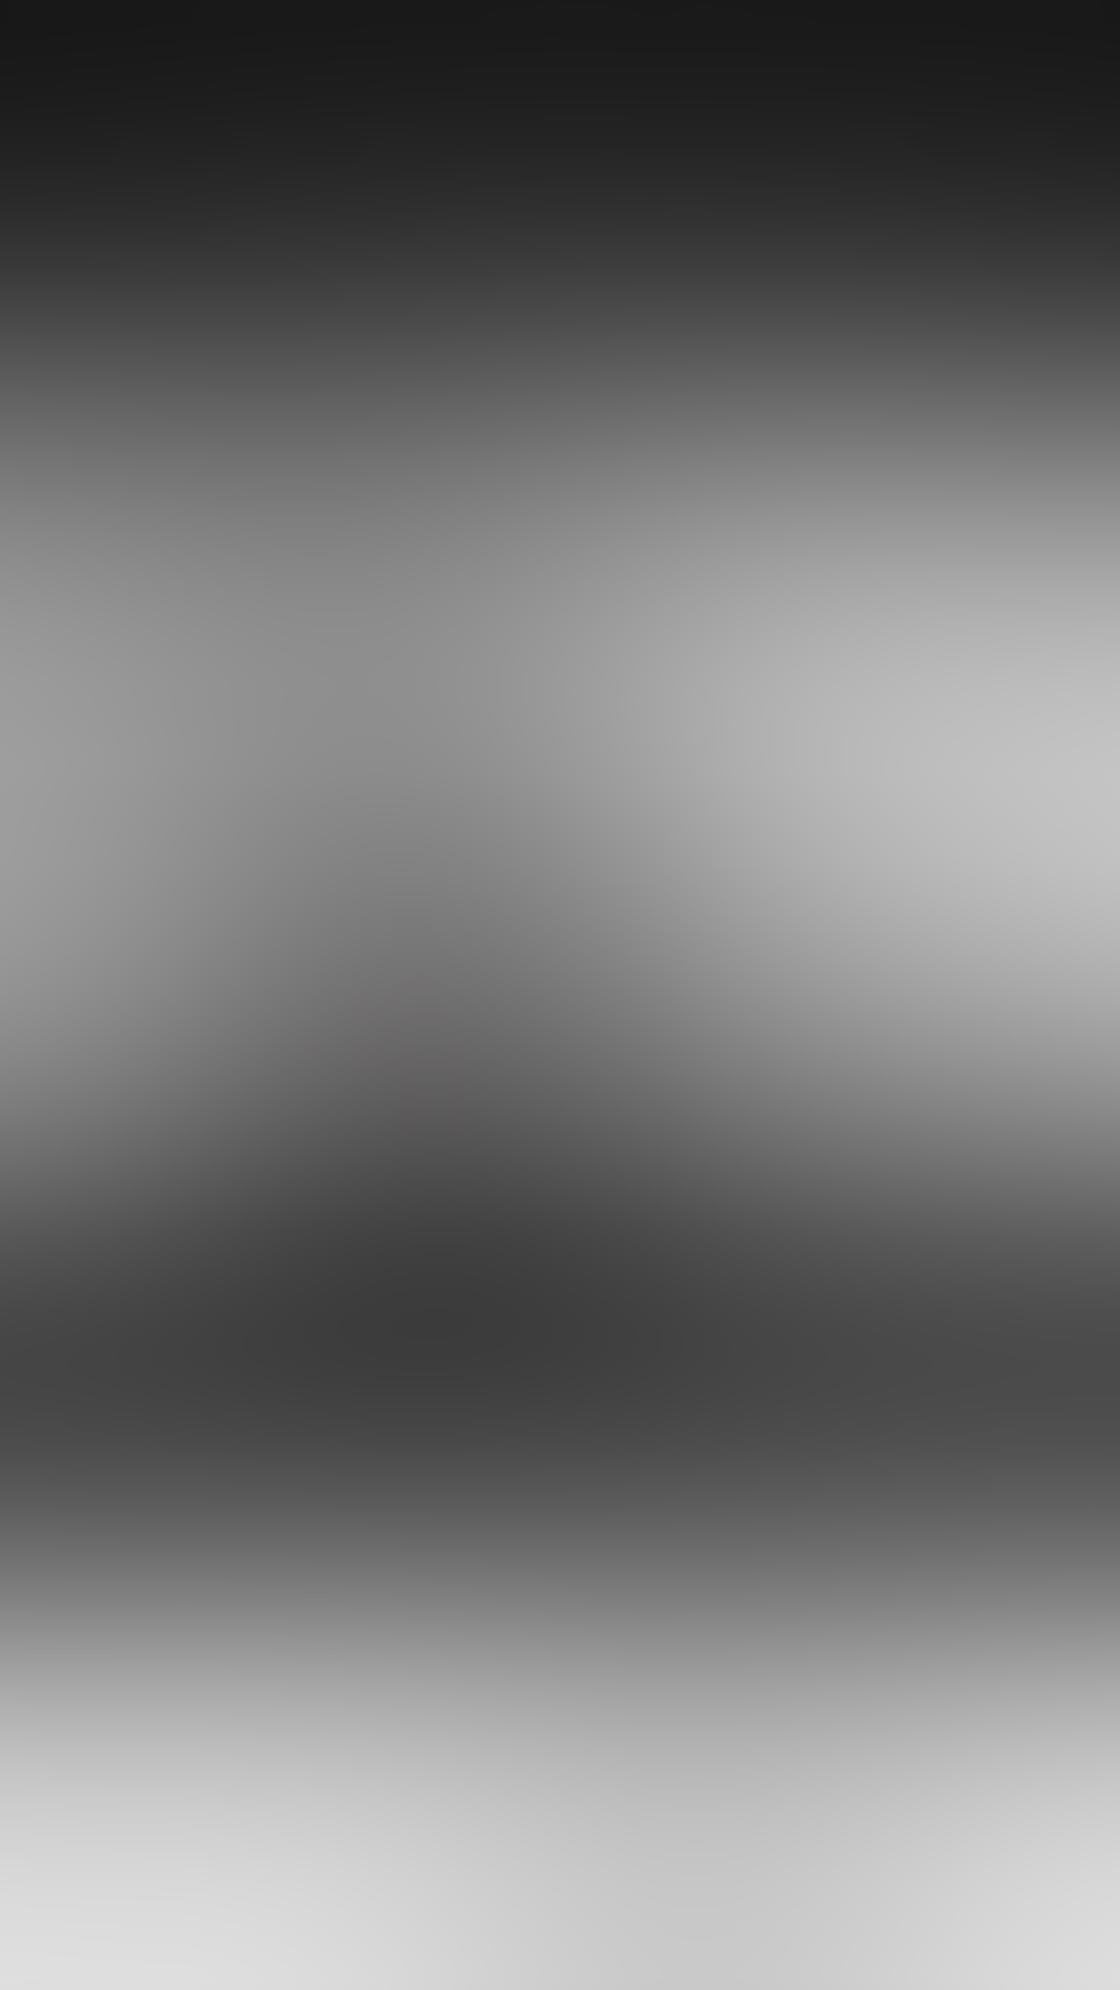 Lens Distortions iPhone App 4